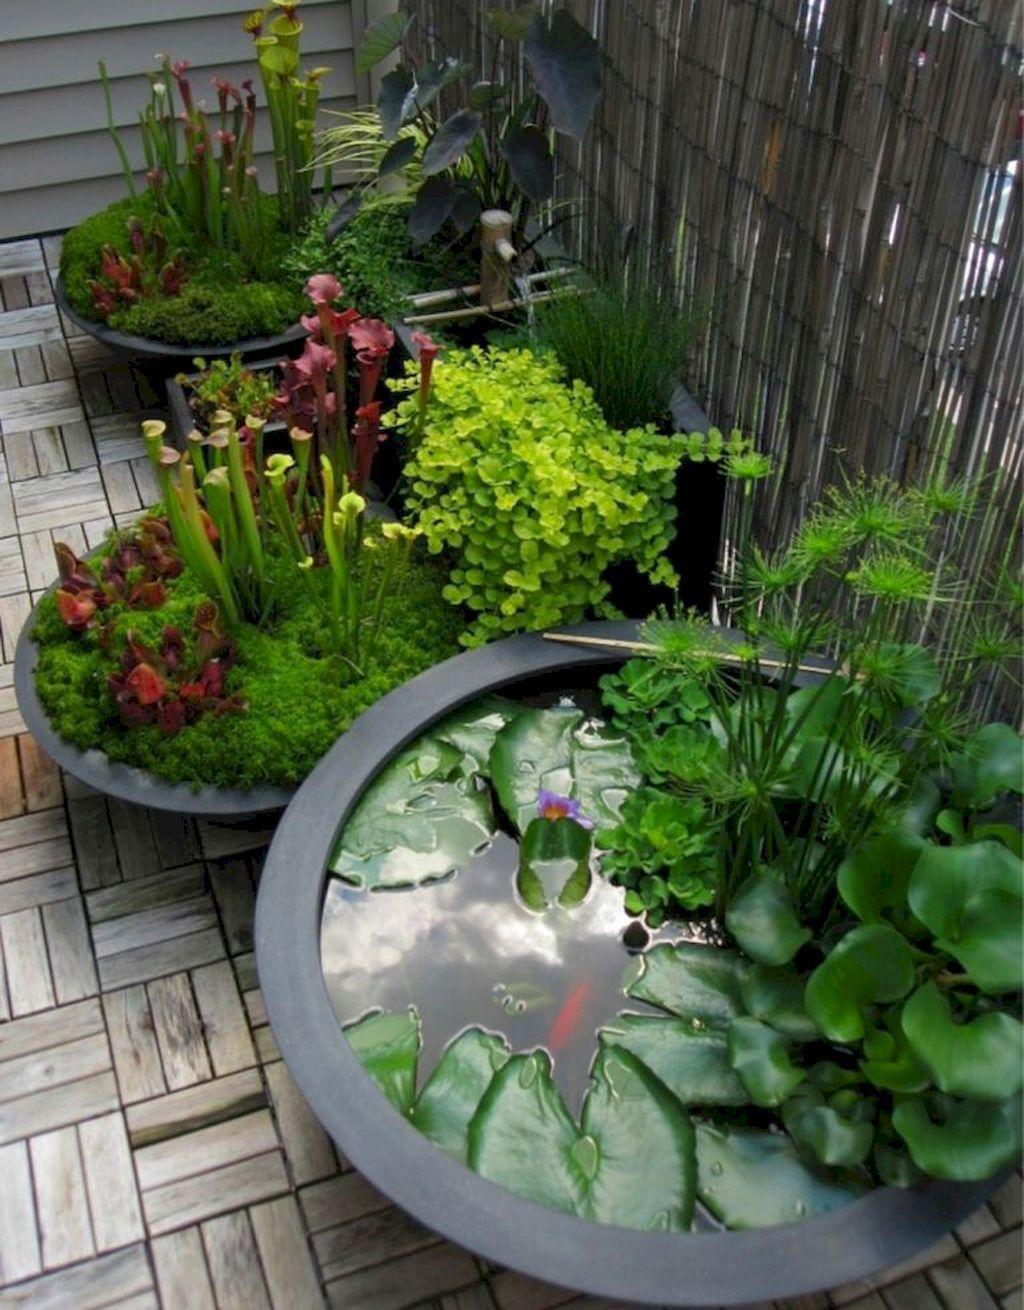 Pin by erin lindsey morice on outdoor ideas pinterest garden